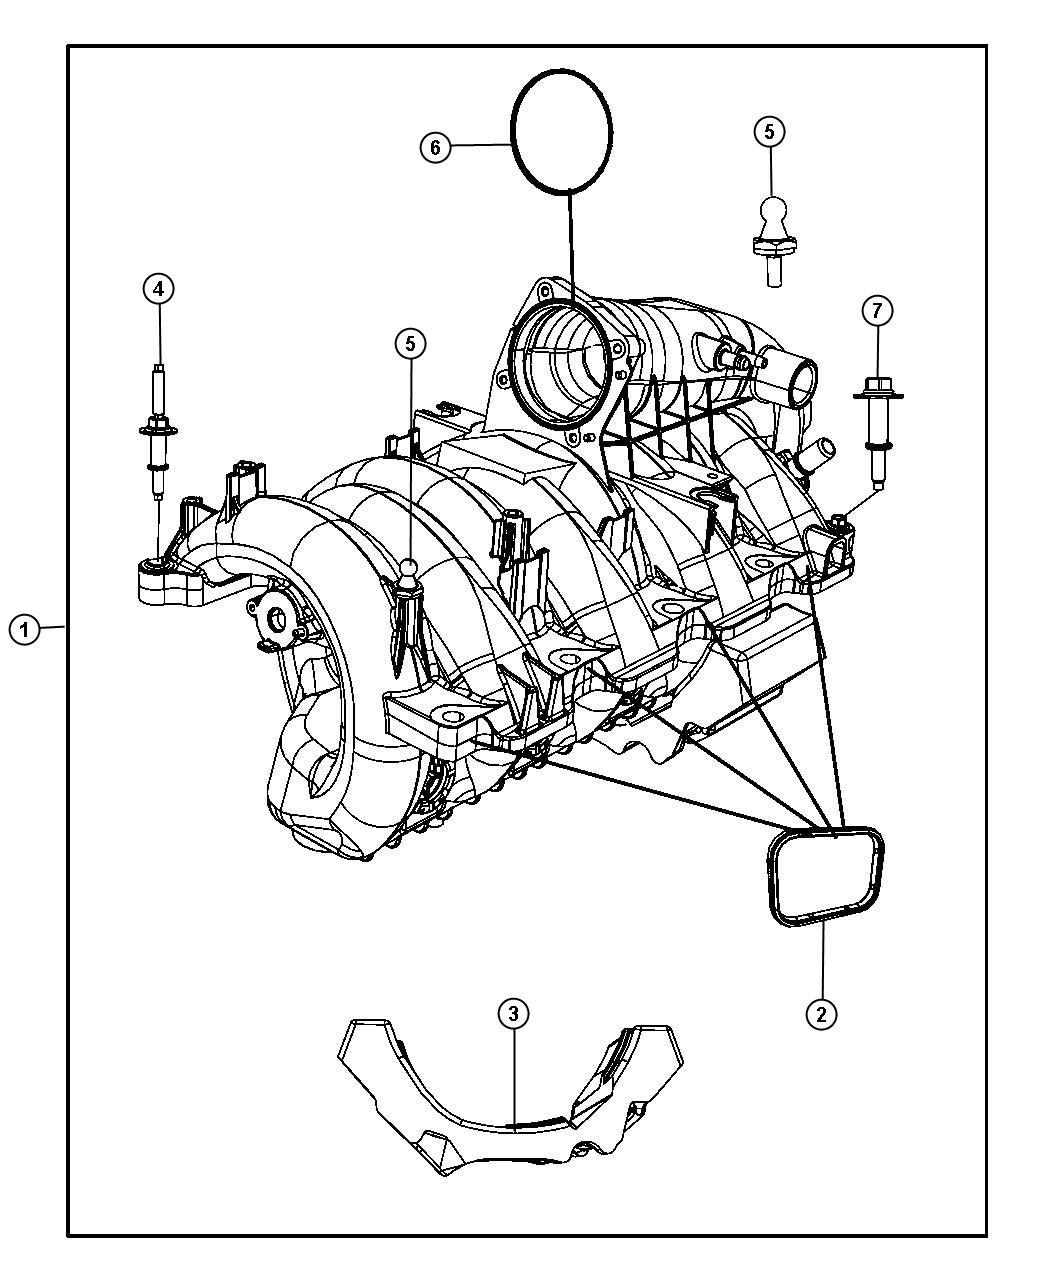 Dodge Durango Seal. Intake manifold. Crew cab. Eve, engine